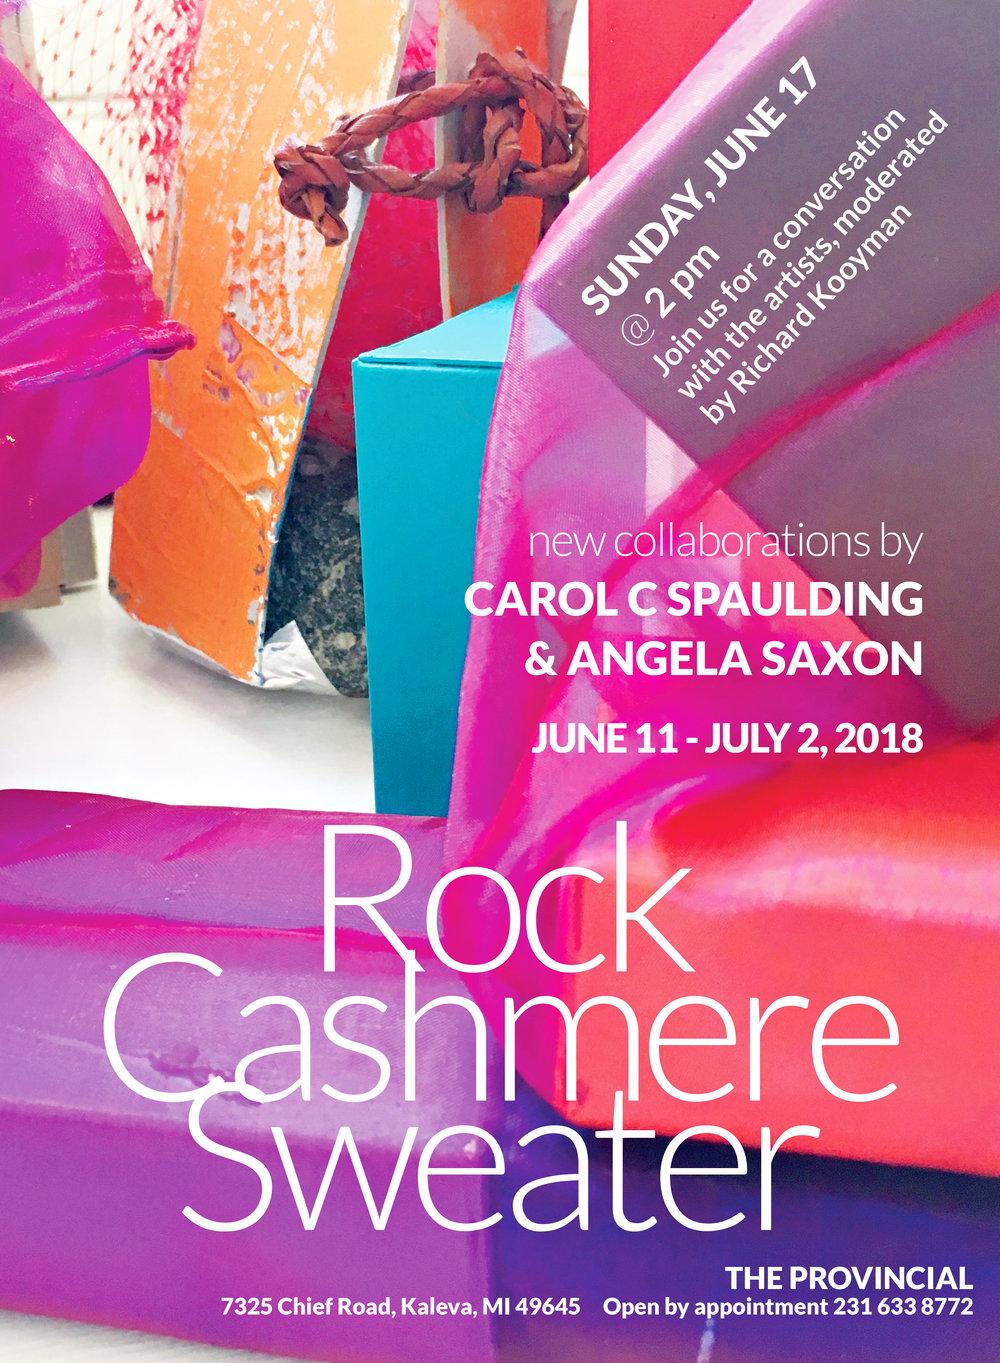 RockCashmereSweater_poster2 (1).jpg